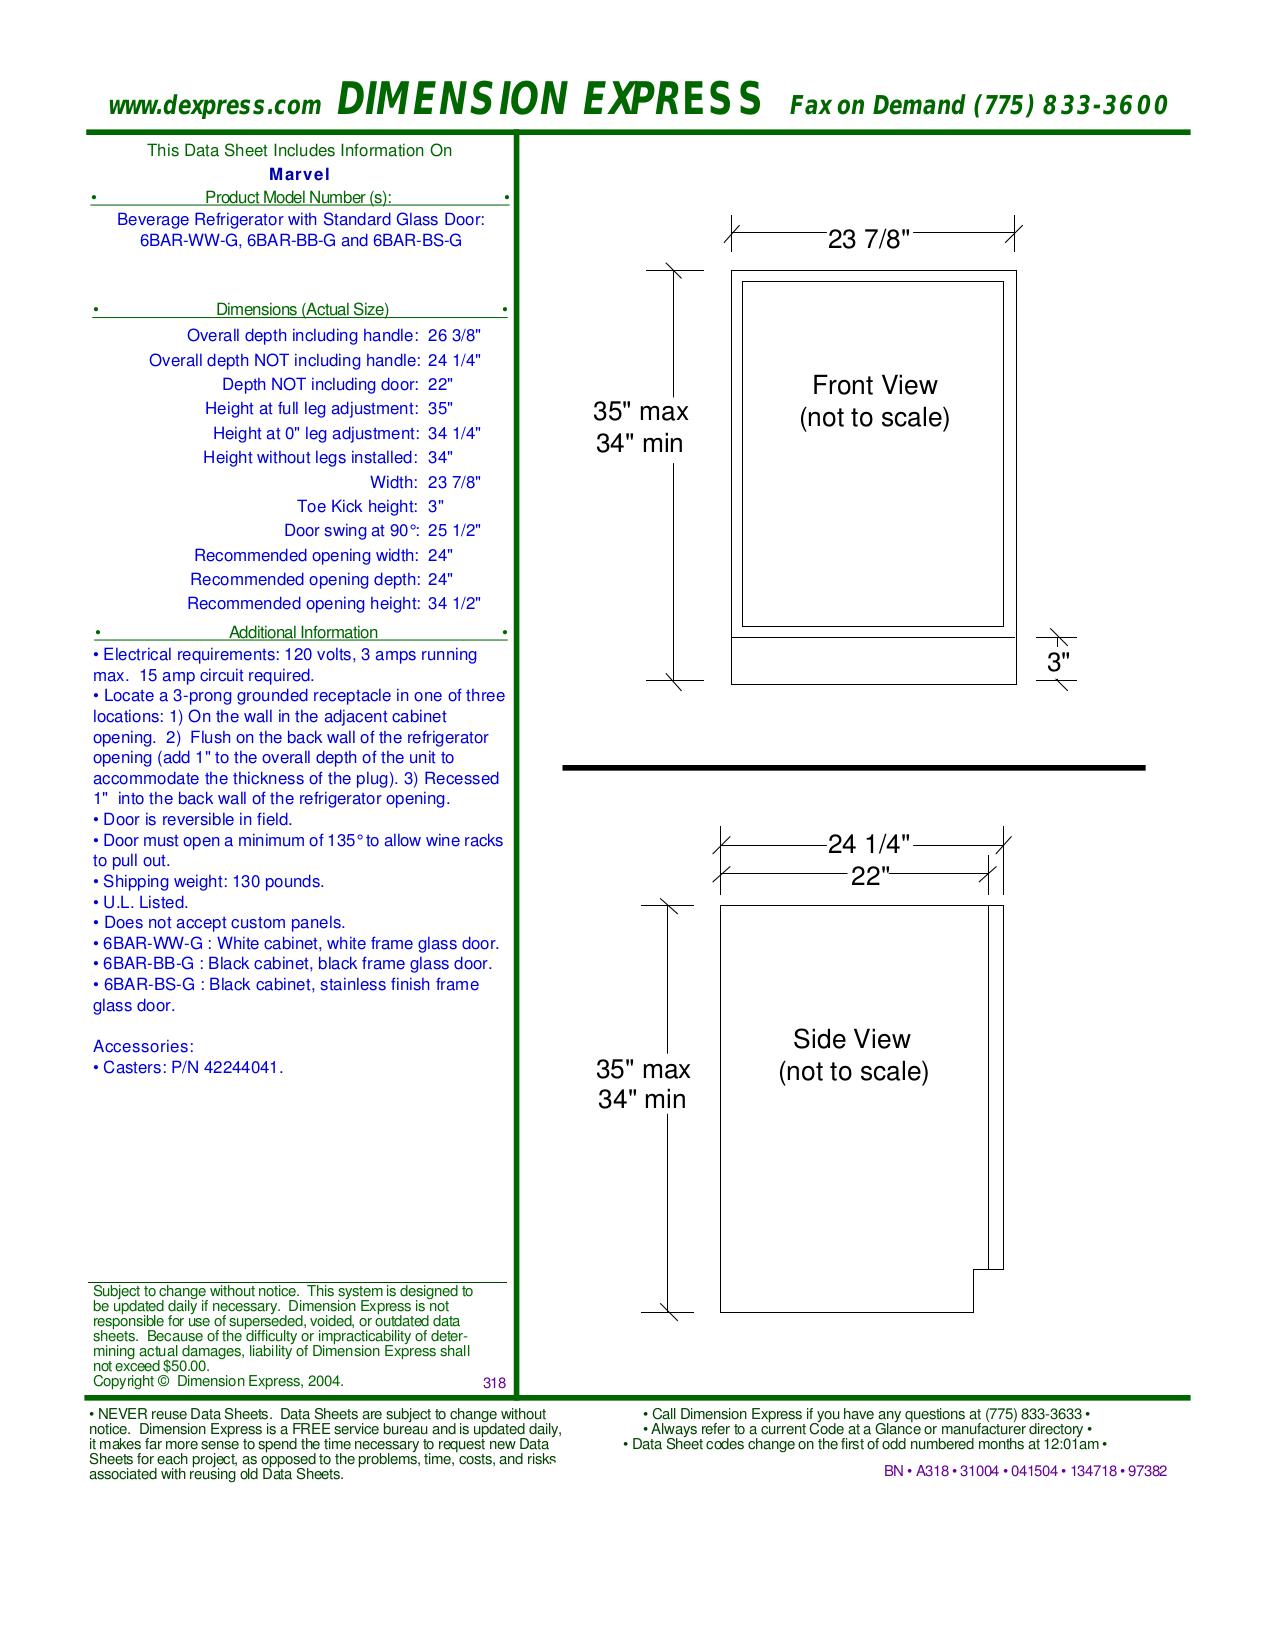 pdf for Marvel Refrigerator 6BAR-BS-G manual